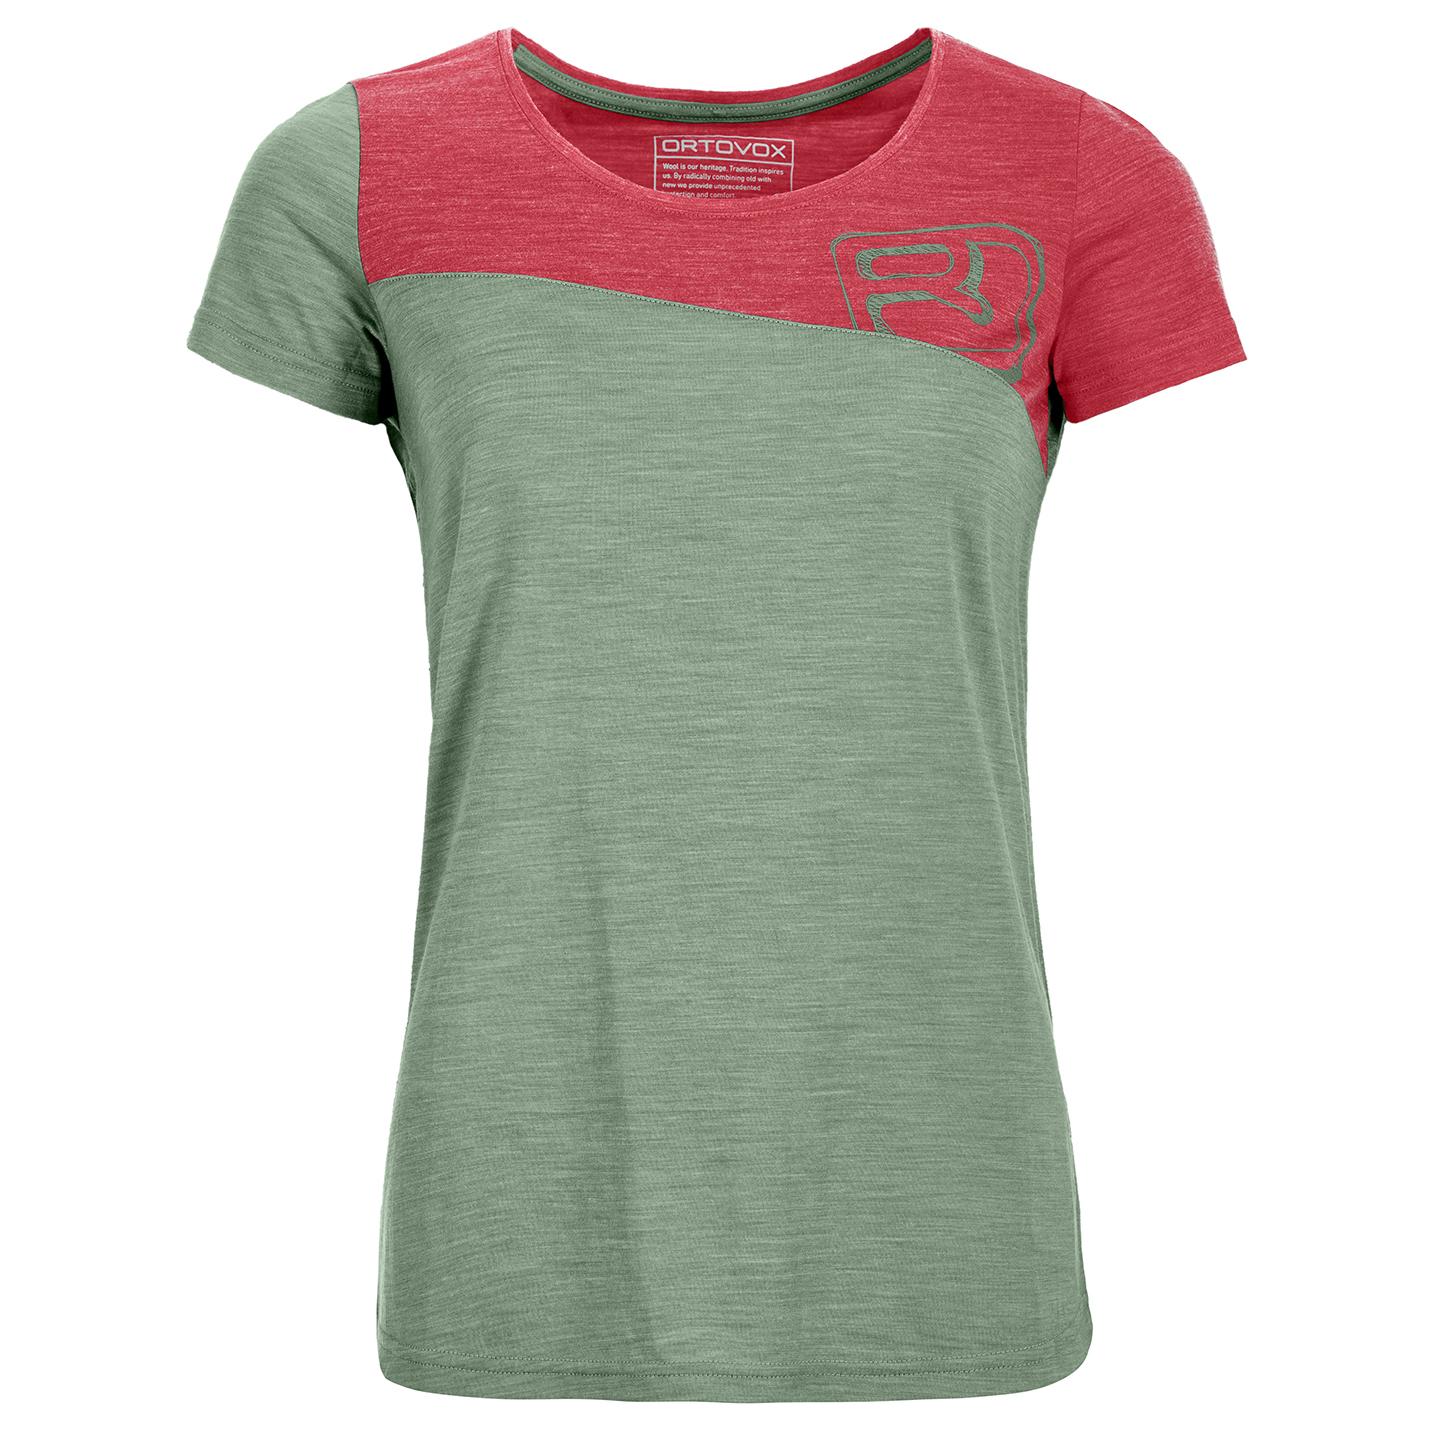 7402dcac1 Ortovox 150 Cool Logo T-Shirt - T-Shirt Women's | Free UK Delivery ...